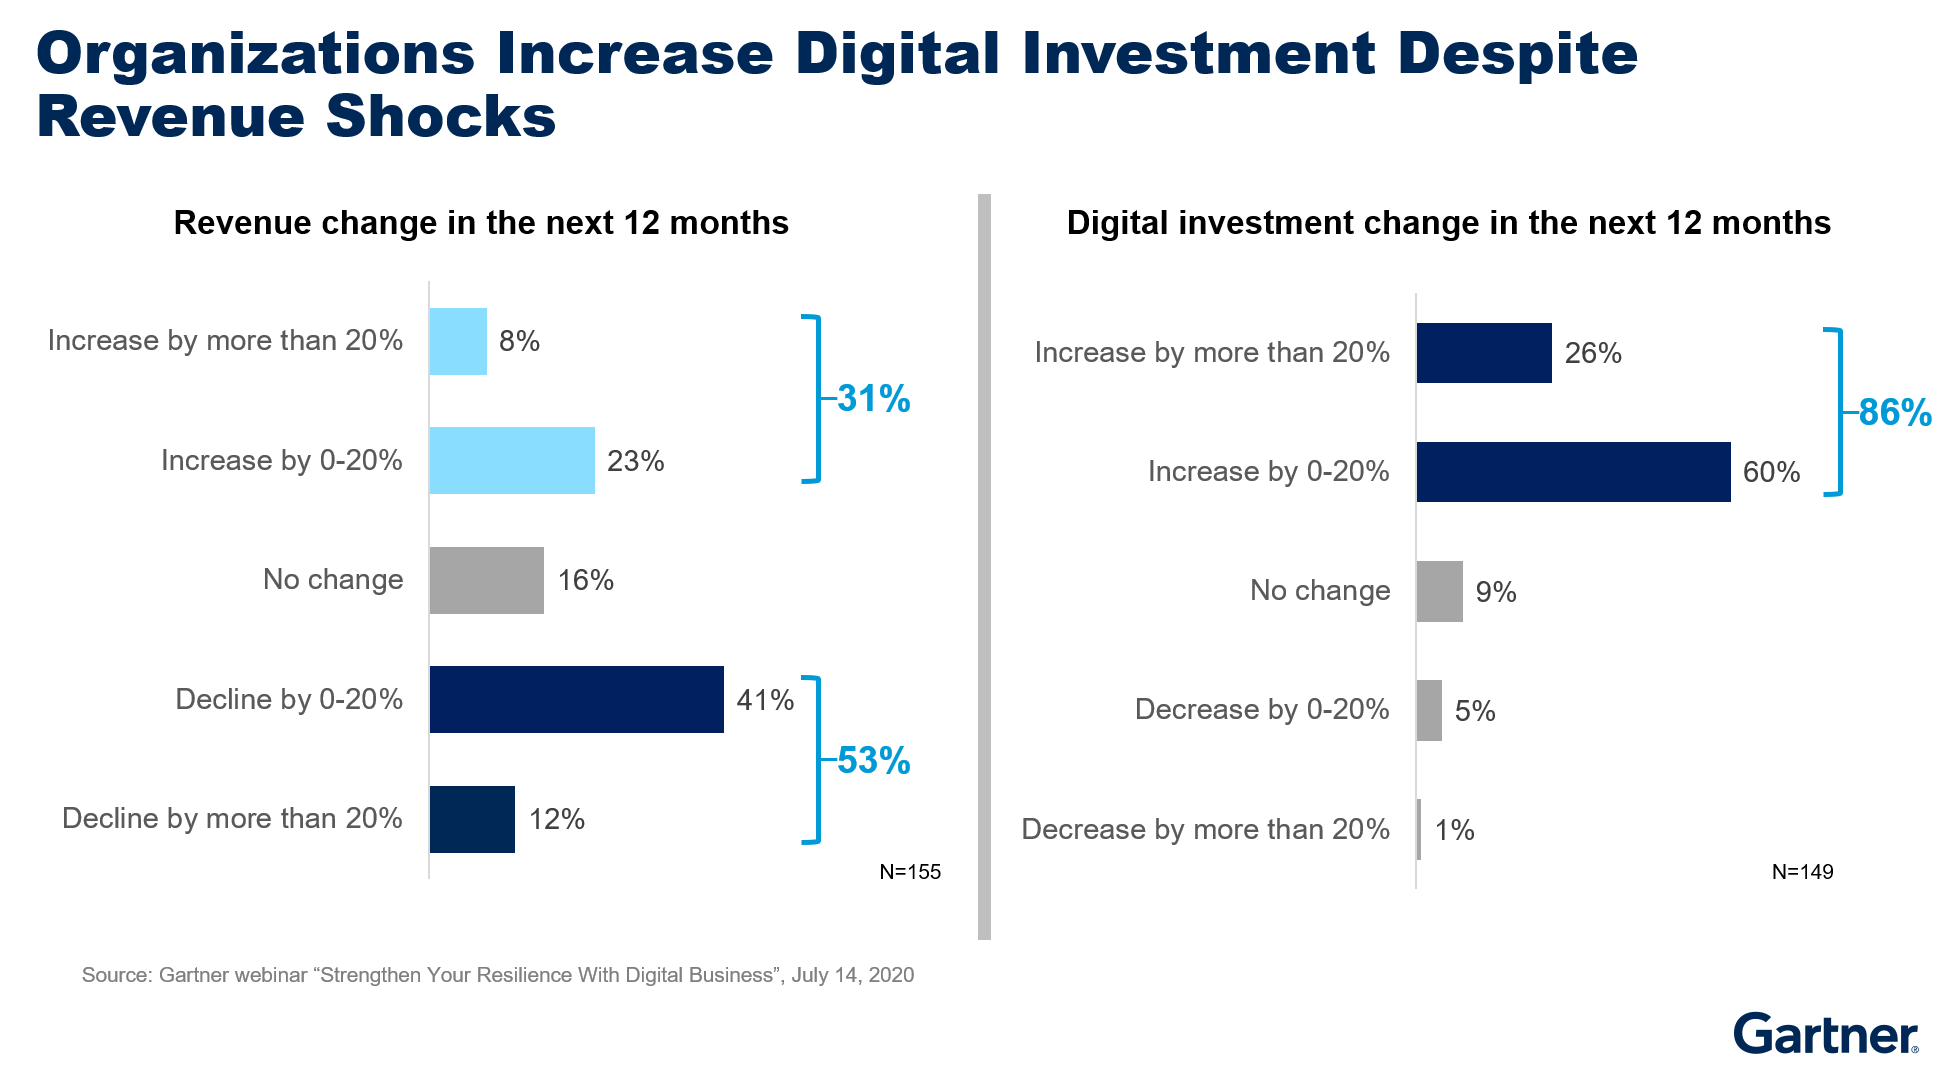 Figure 1. Organizations Increase Digital Investments Despite Revenue Shocks